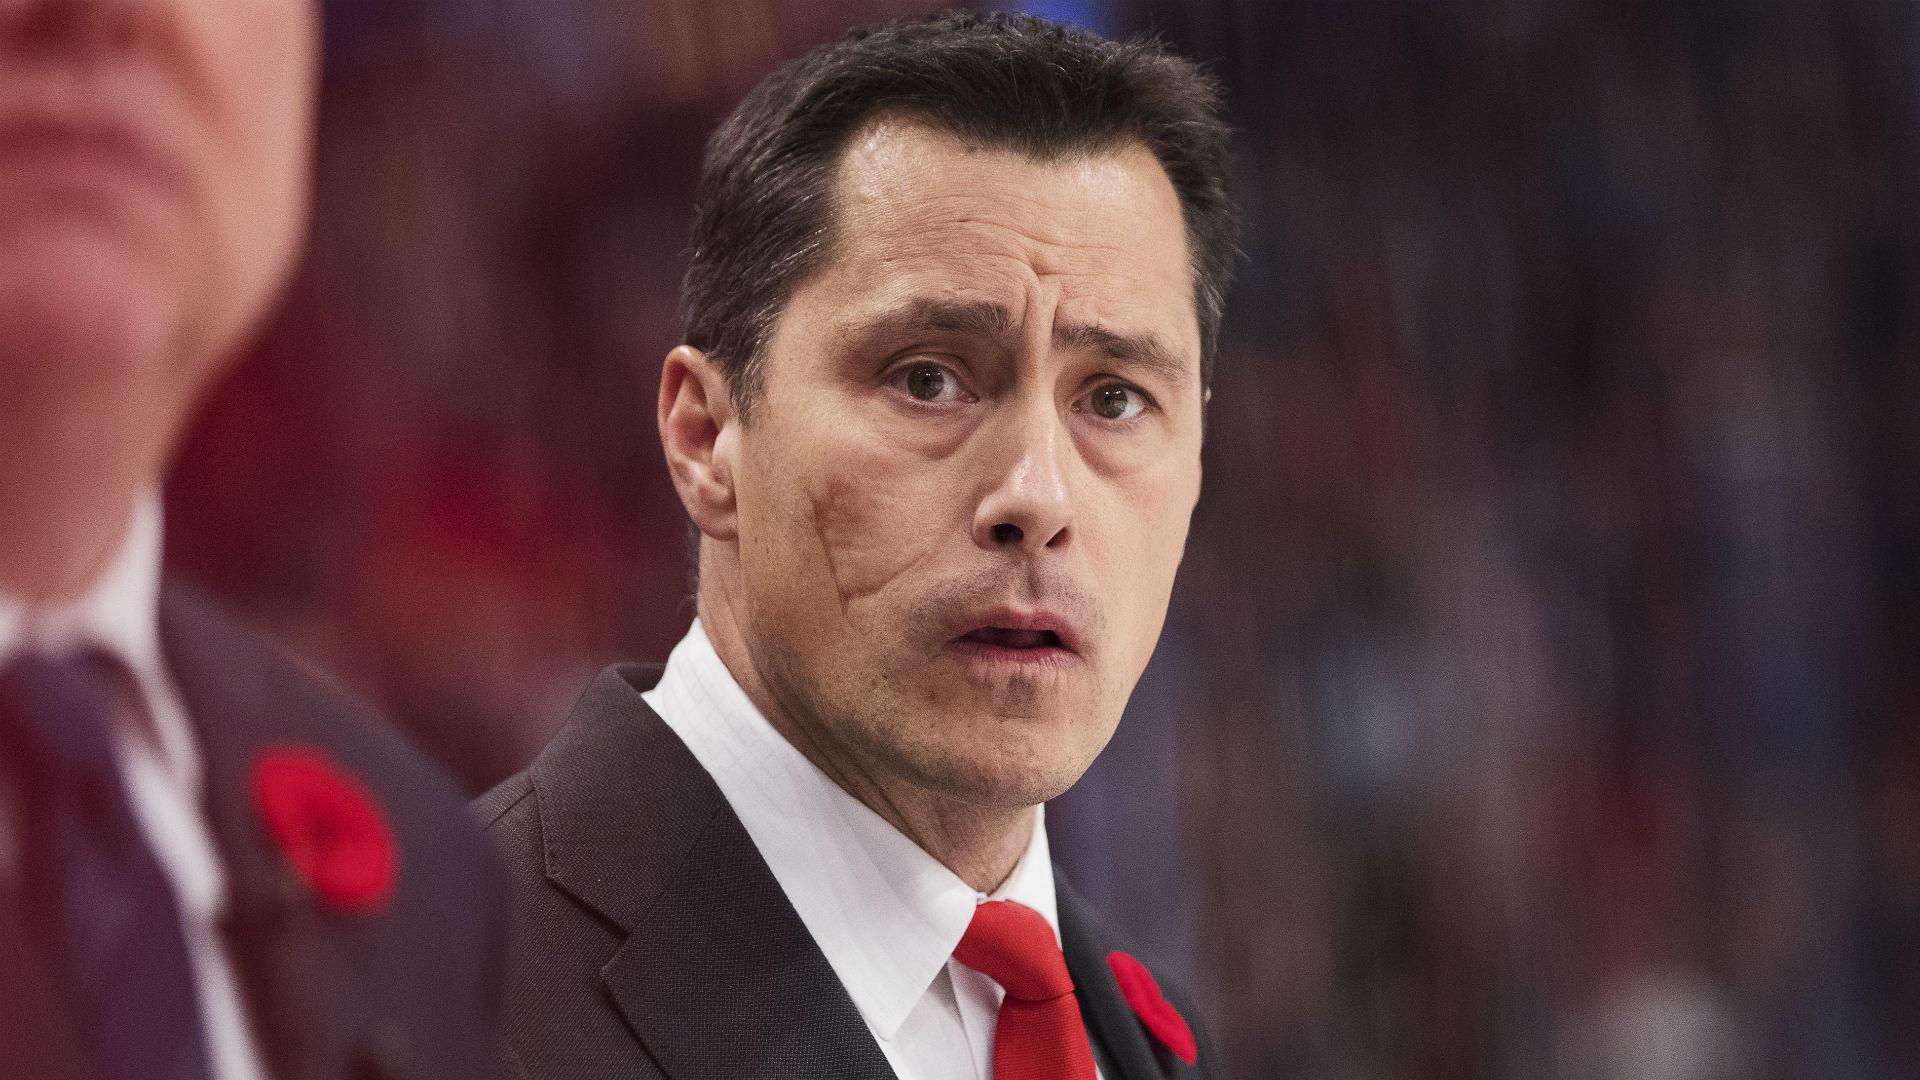 Pierre Dorion says Senators coach Guy Boucher will return next season